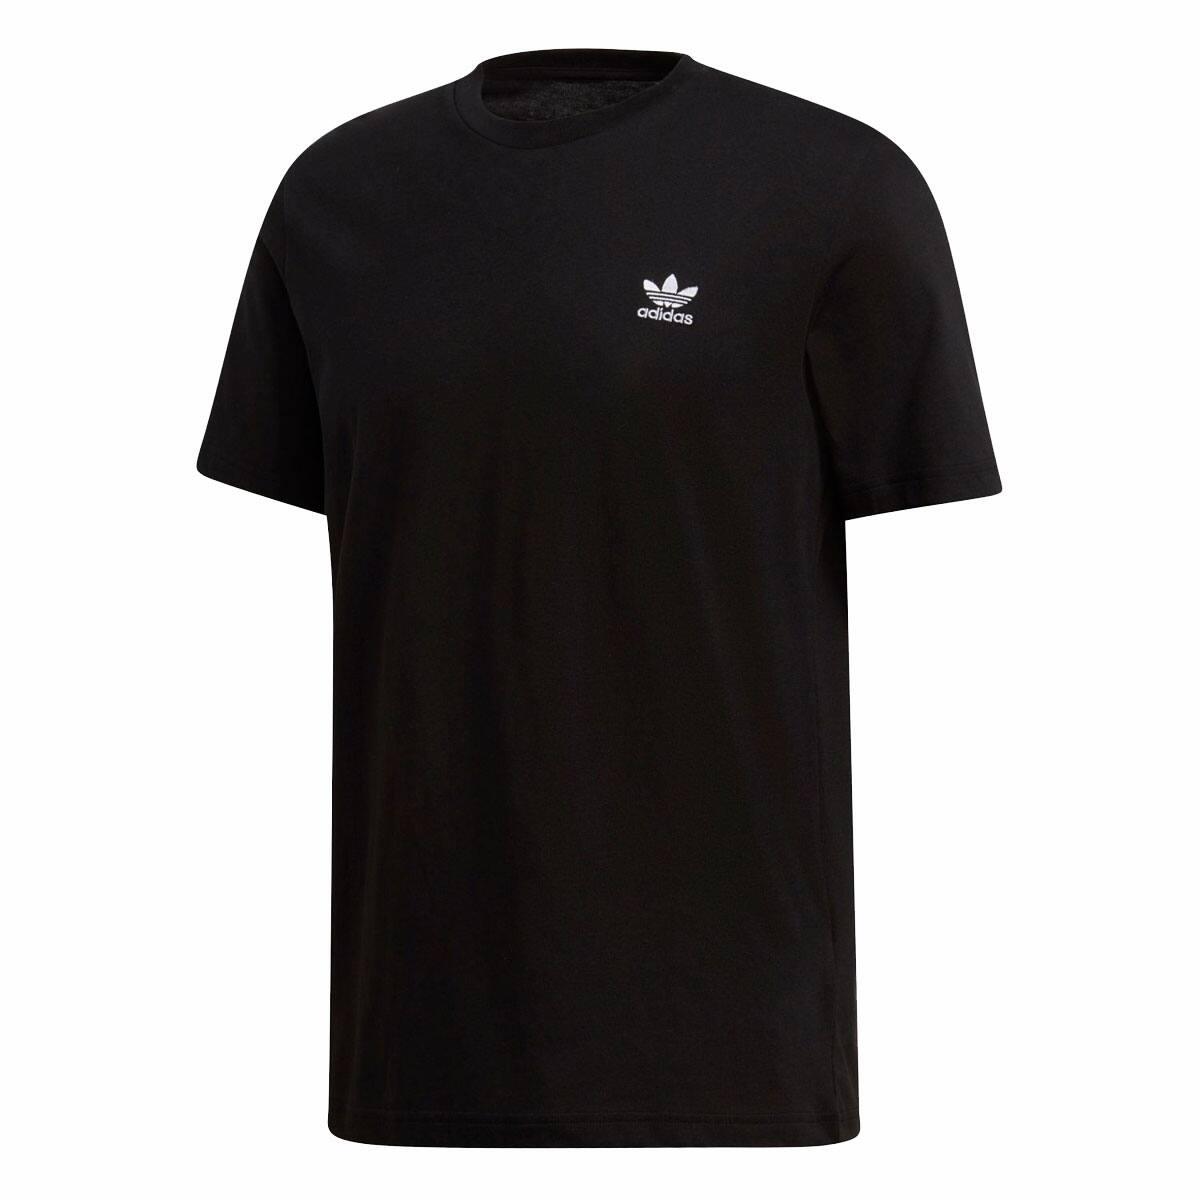 adidas Originals ESSENTIAL TEE BLACK 19SS-I_photo_large